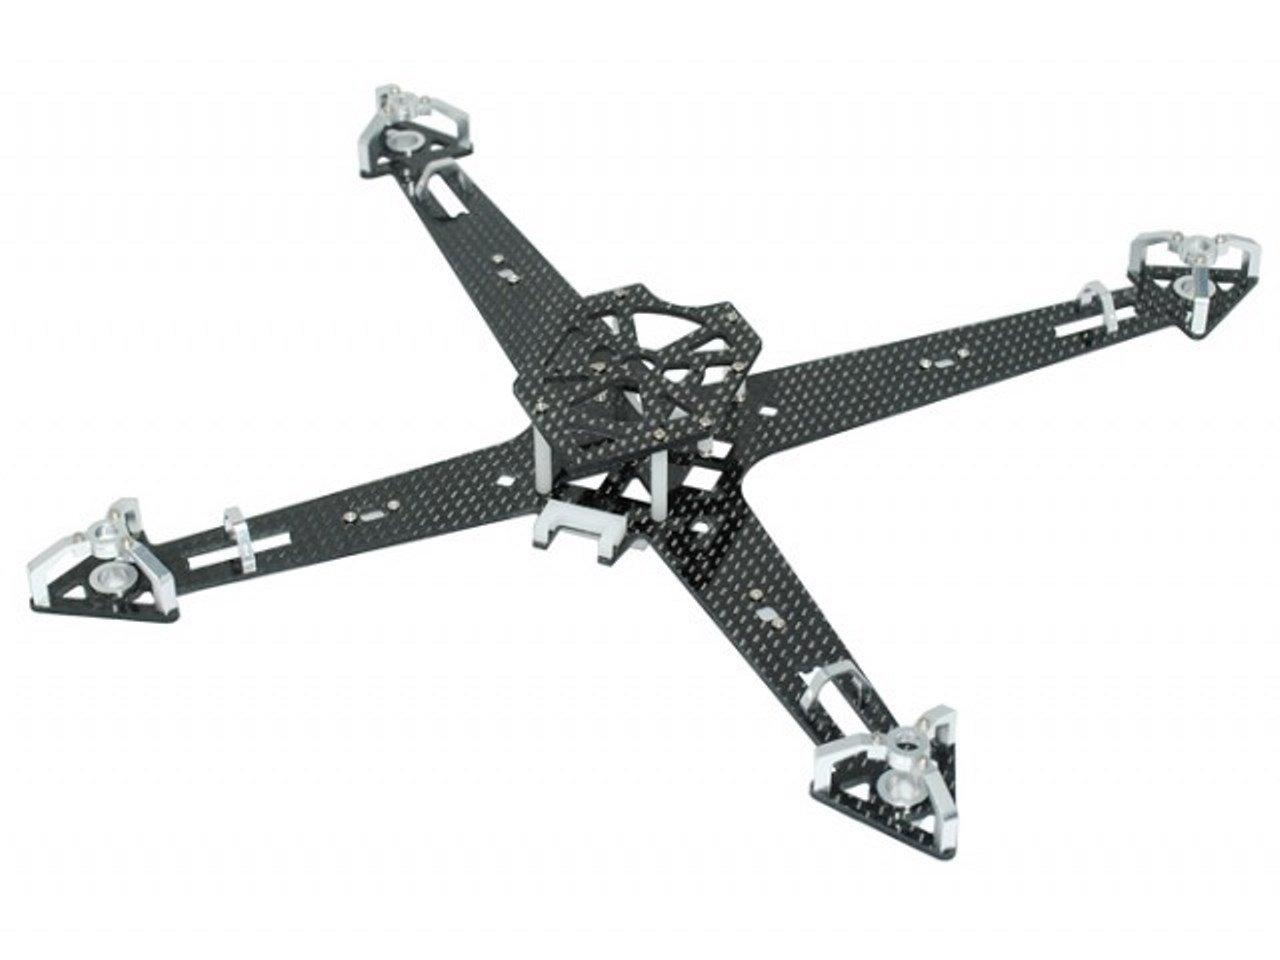 Amazon.com: Microheli CNC Aluminum/Carbon Fiber Quadcopter Frame Kit ...